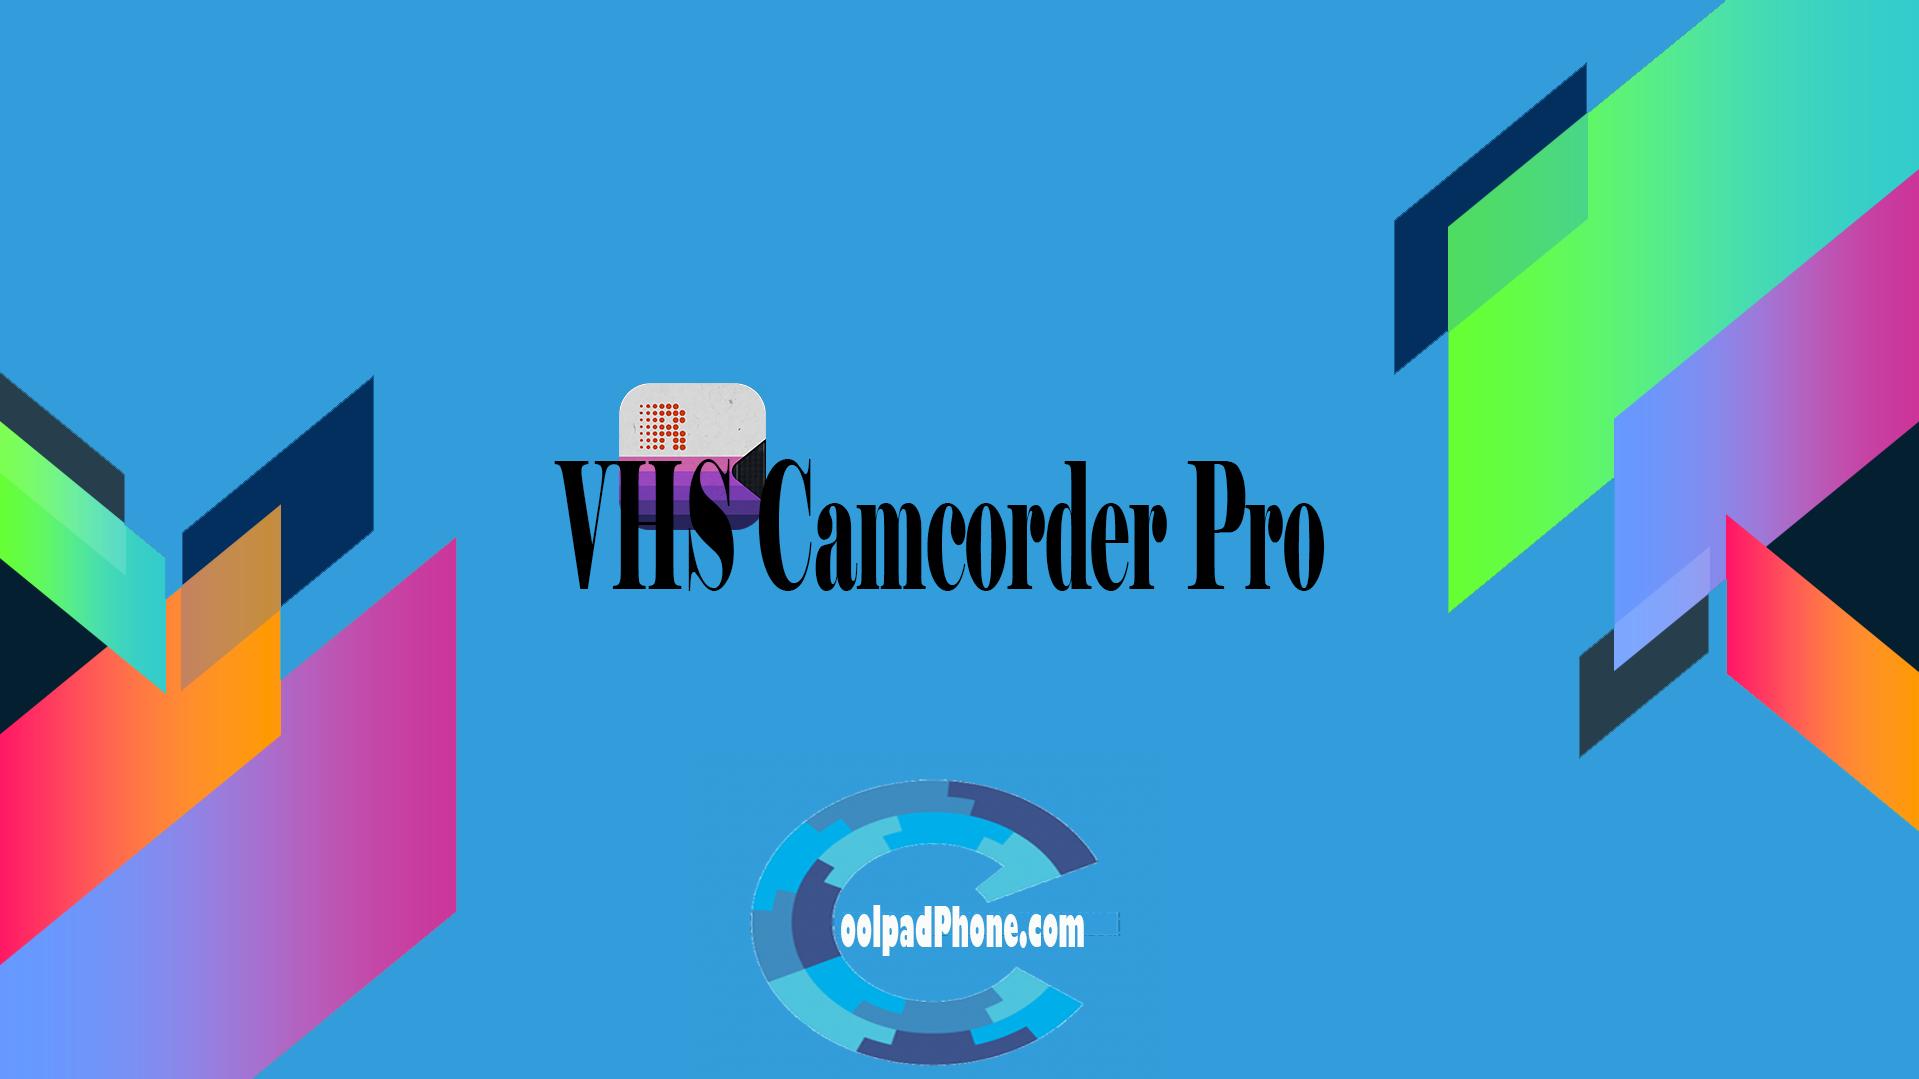 VHS Camcorder Pro